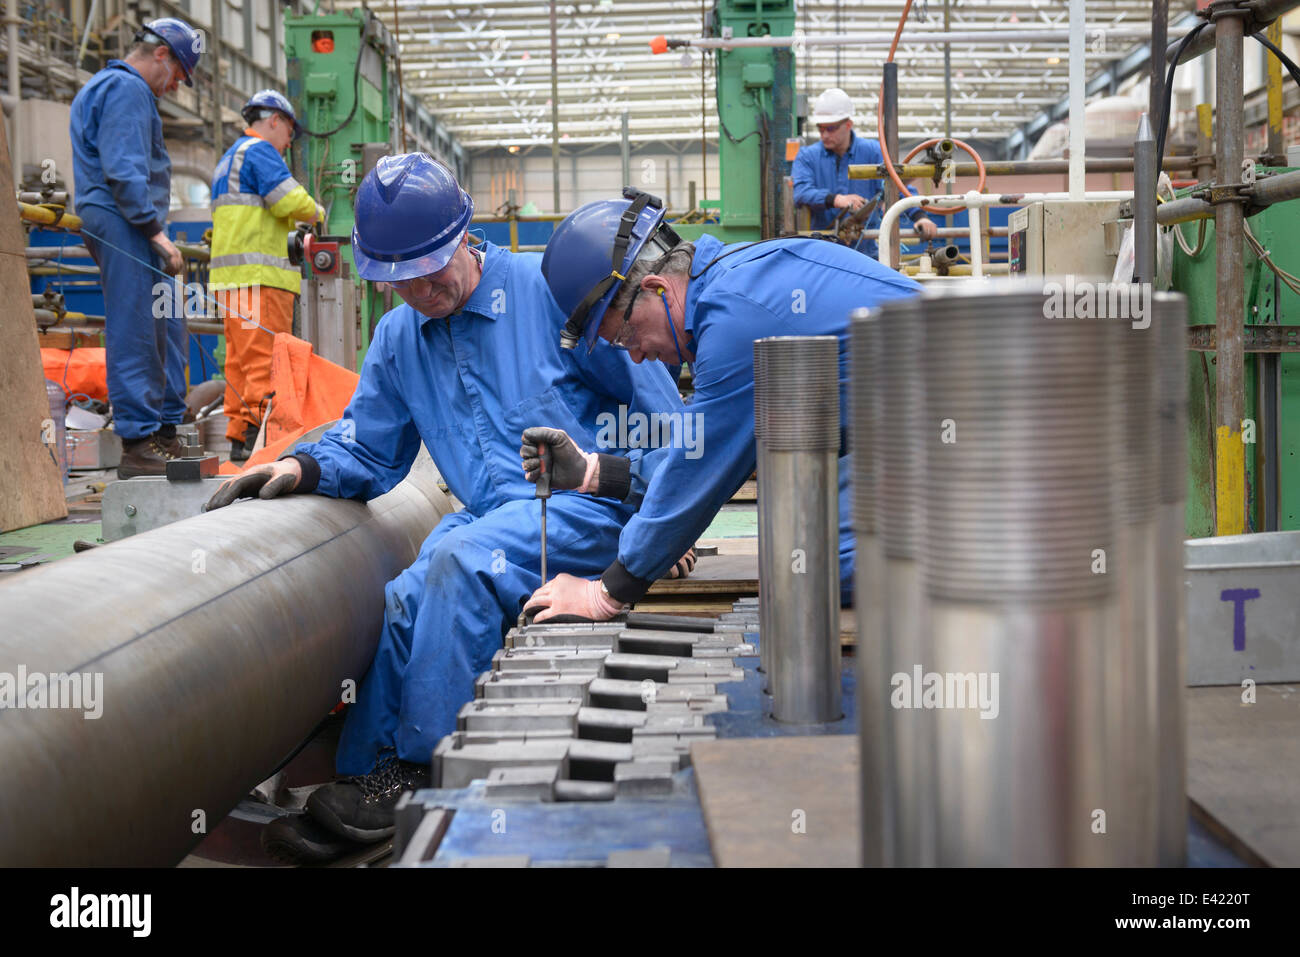 Ingenieure arbeiten an Turbinengehäuse zu reparieren, während Kraftwerk Ausfalls Stockbild